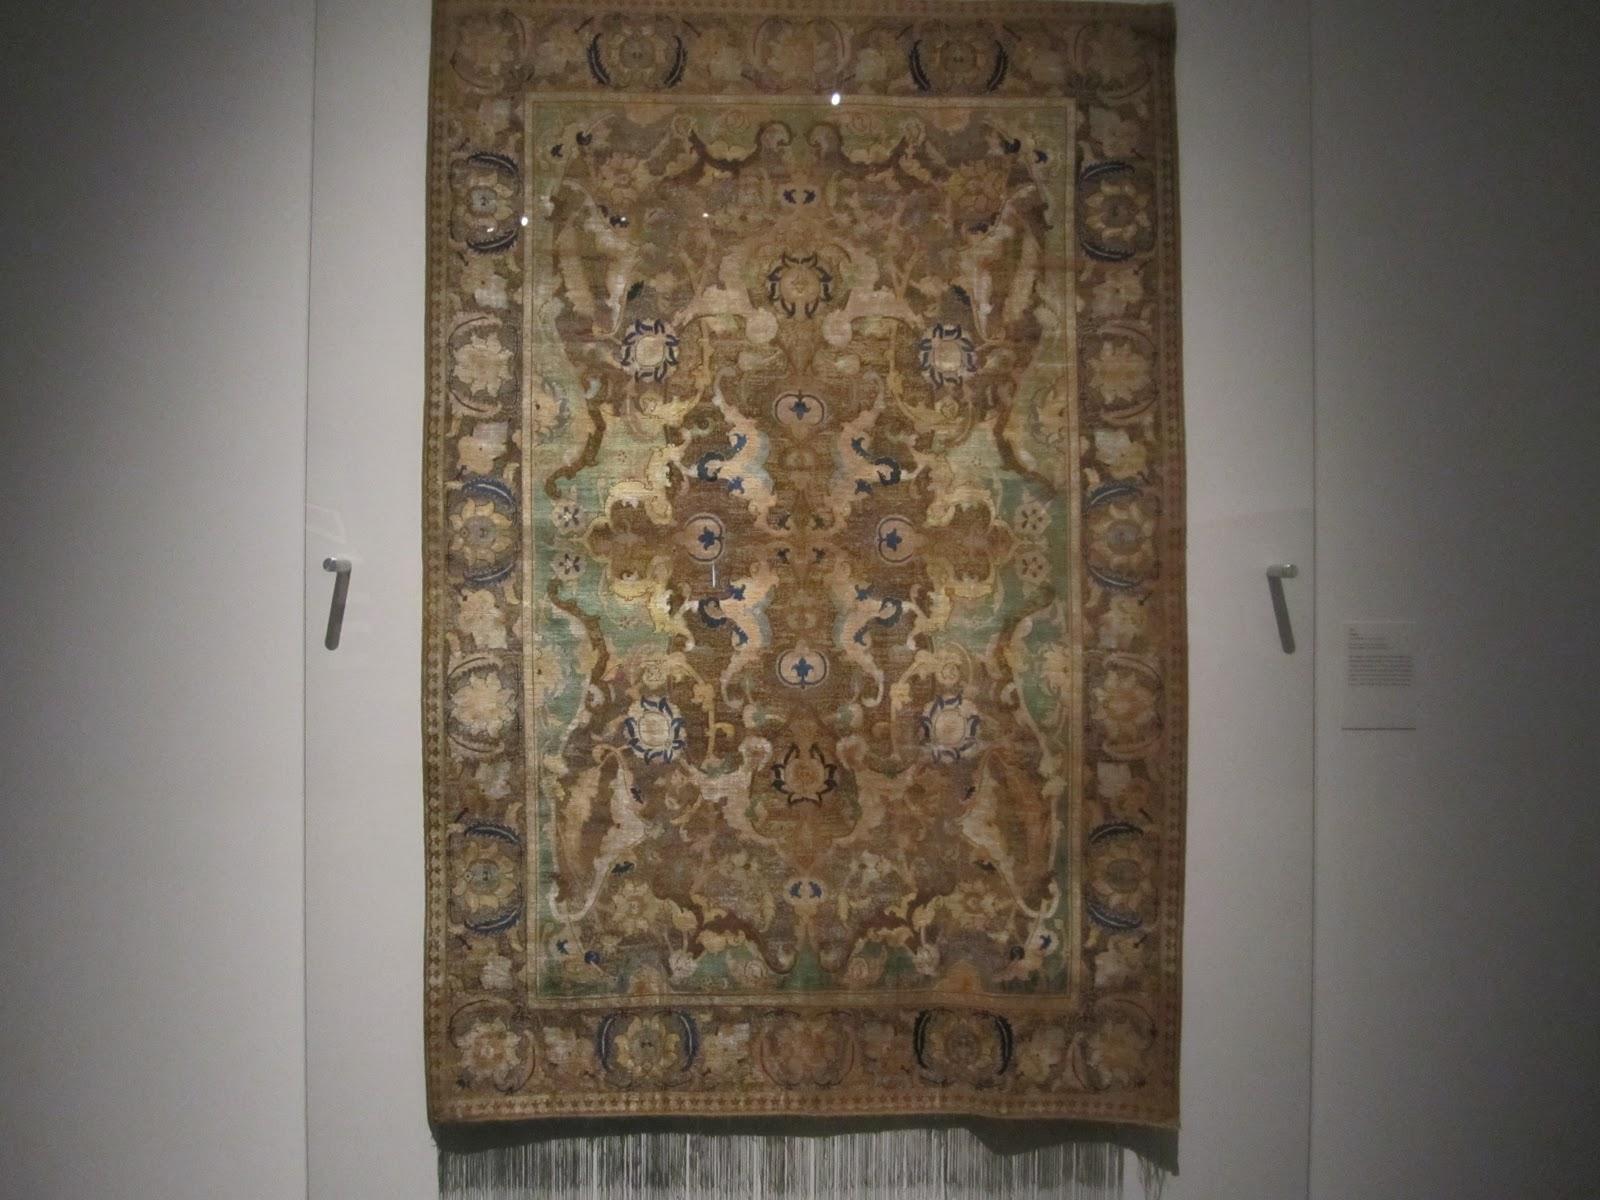 Polonaise antique oriental rugs - Polonaise Persian Carpets Of Iran